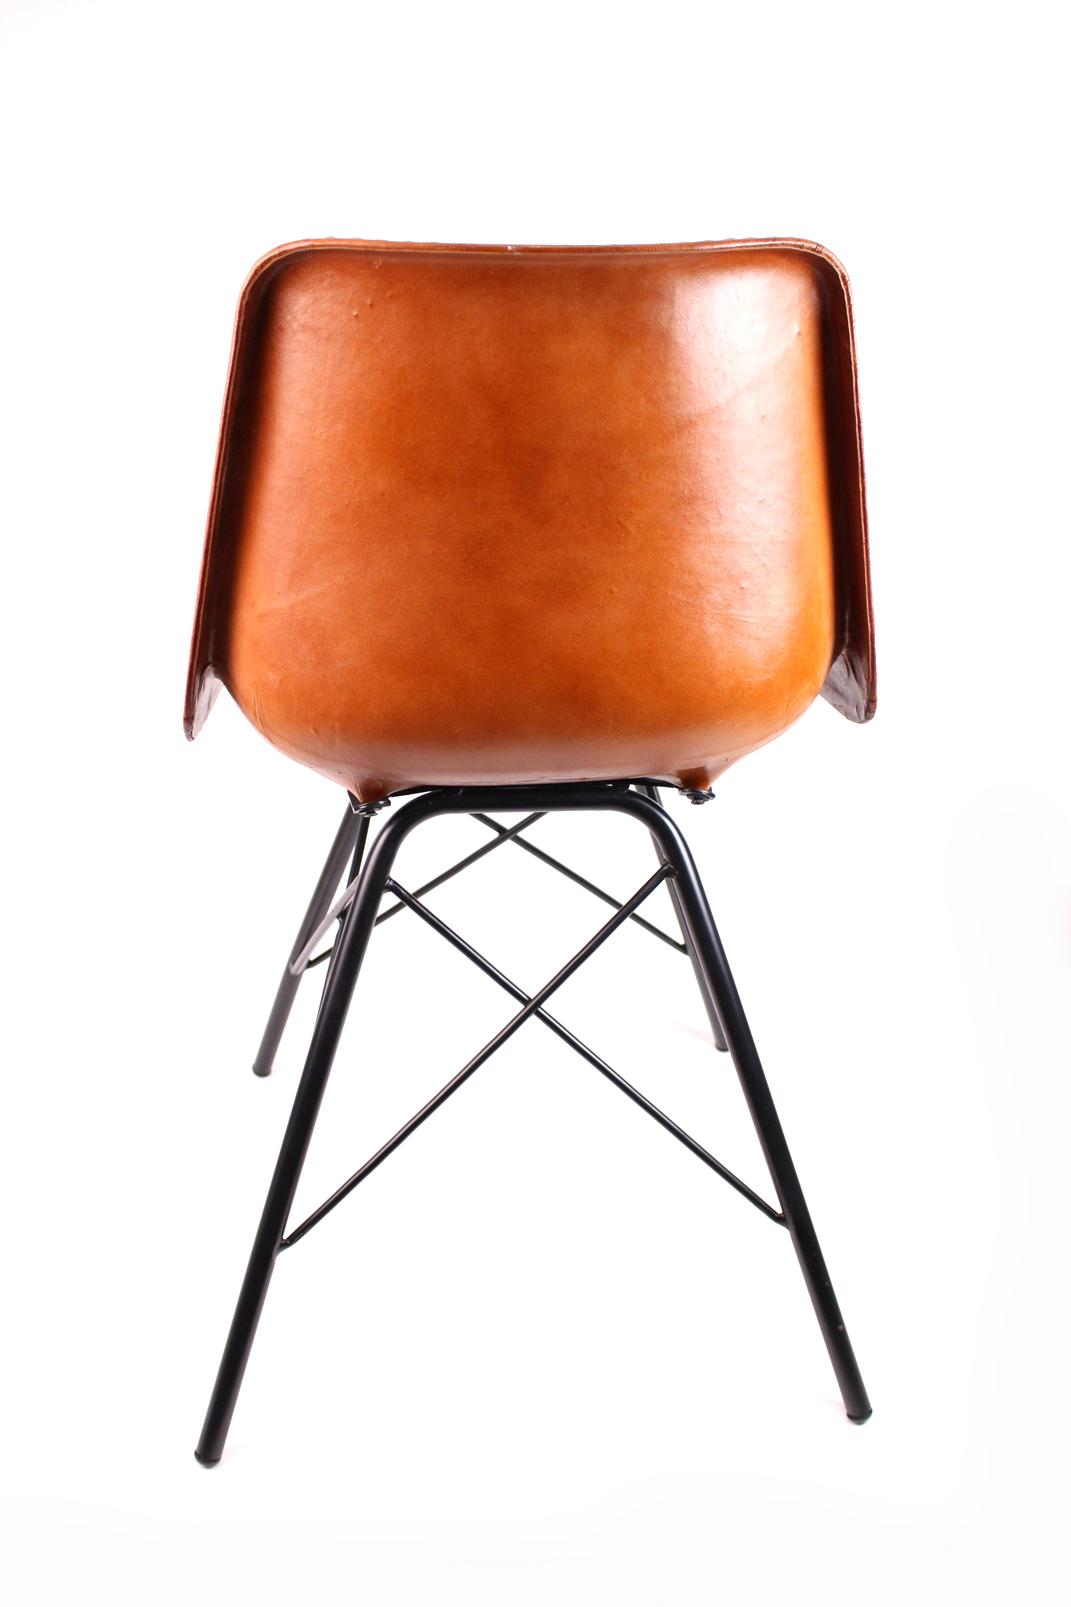 Austerlitz stuhl im industrial stil aus leder metall esszimmerstuhl b rostuhl - Lederstuhl design ...